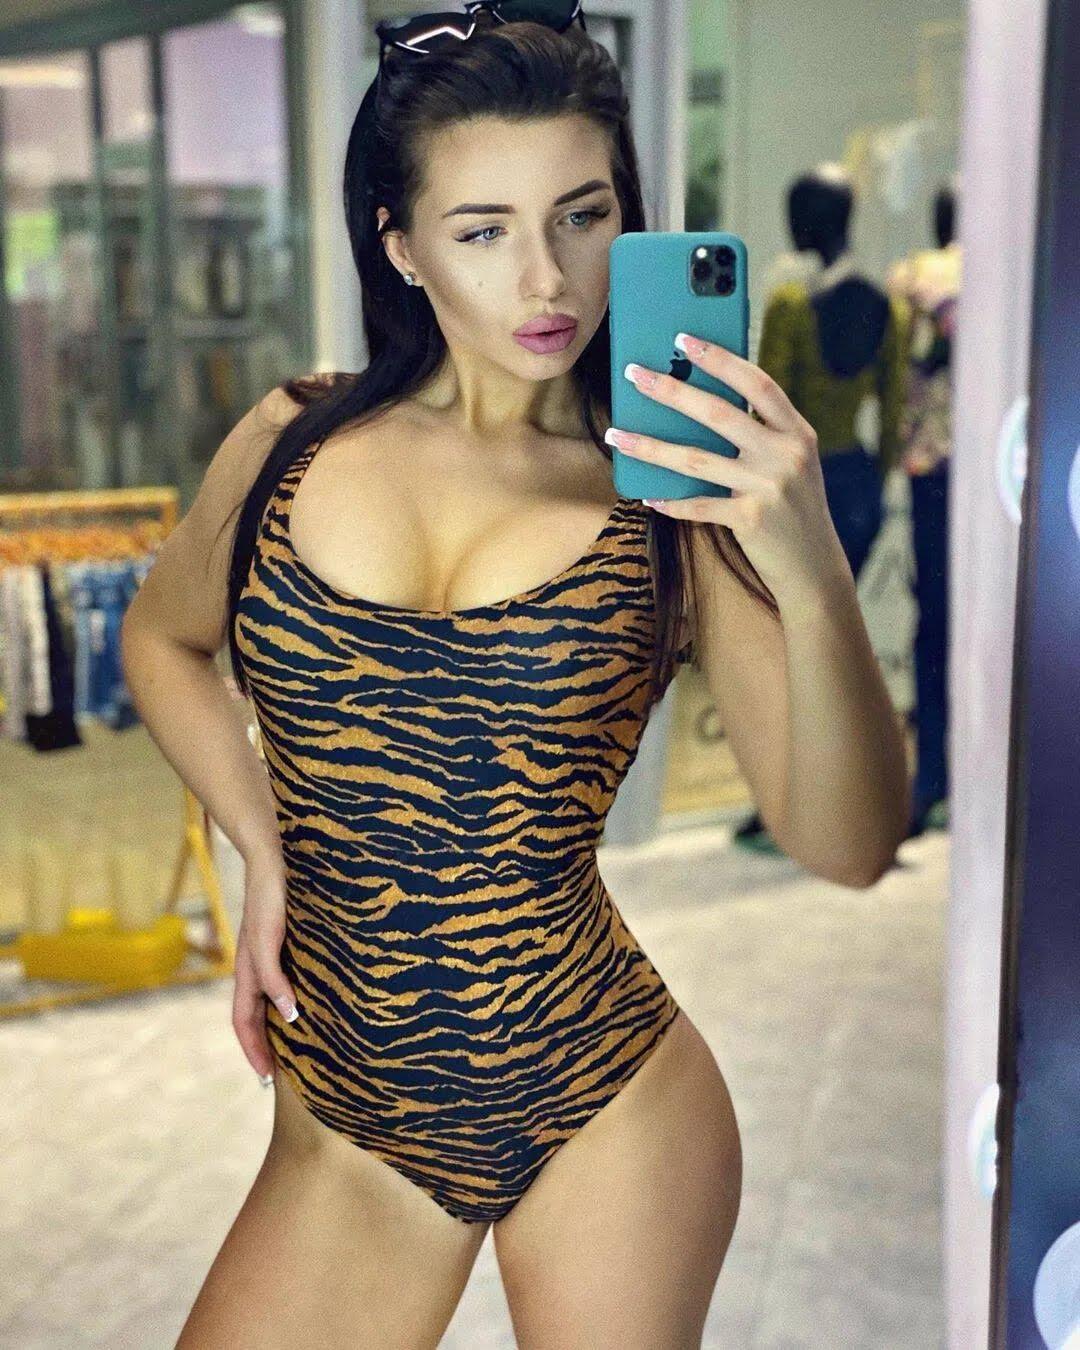 Дівчина Владислава Кочергіна Карина в леопардовому купальнику